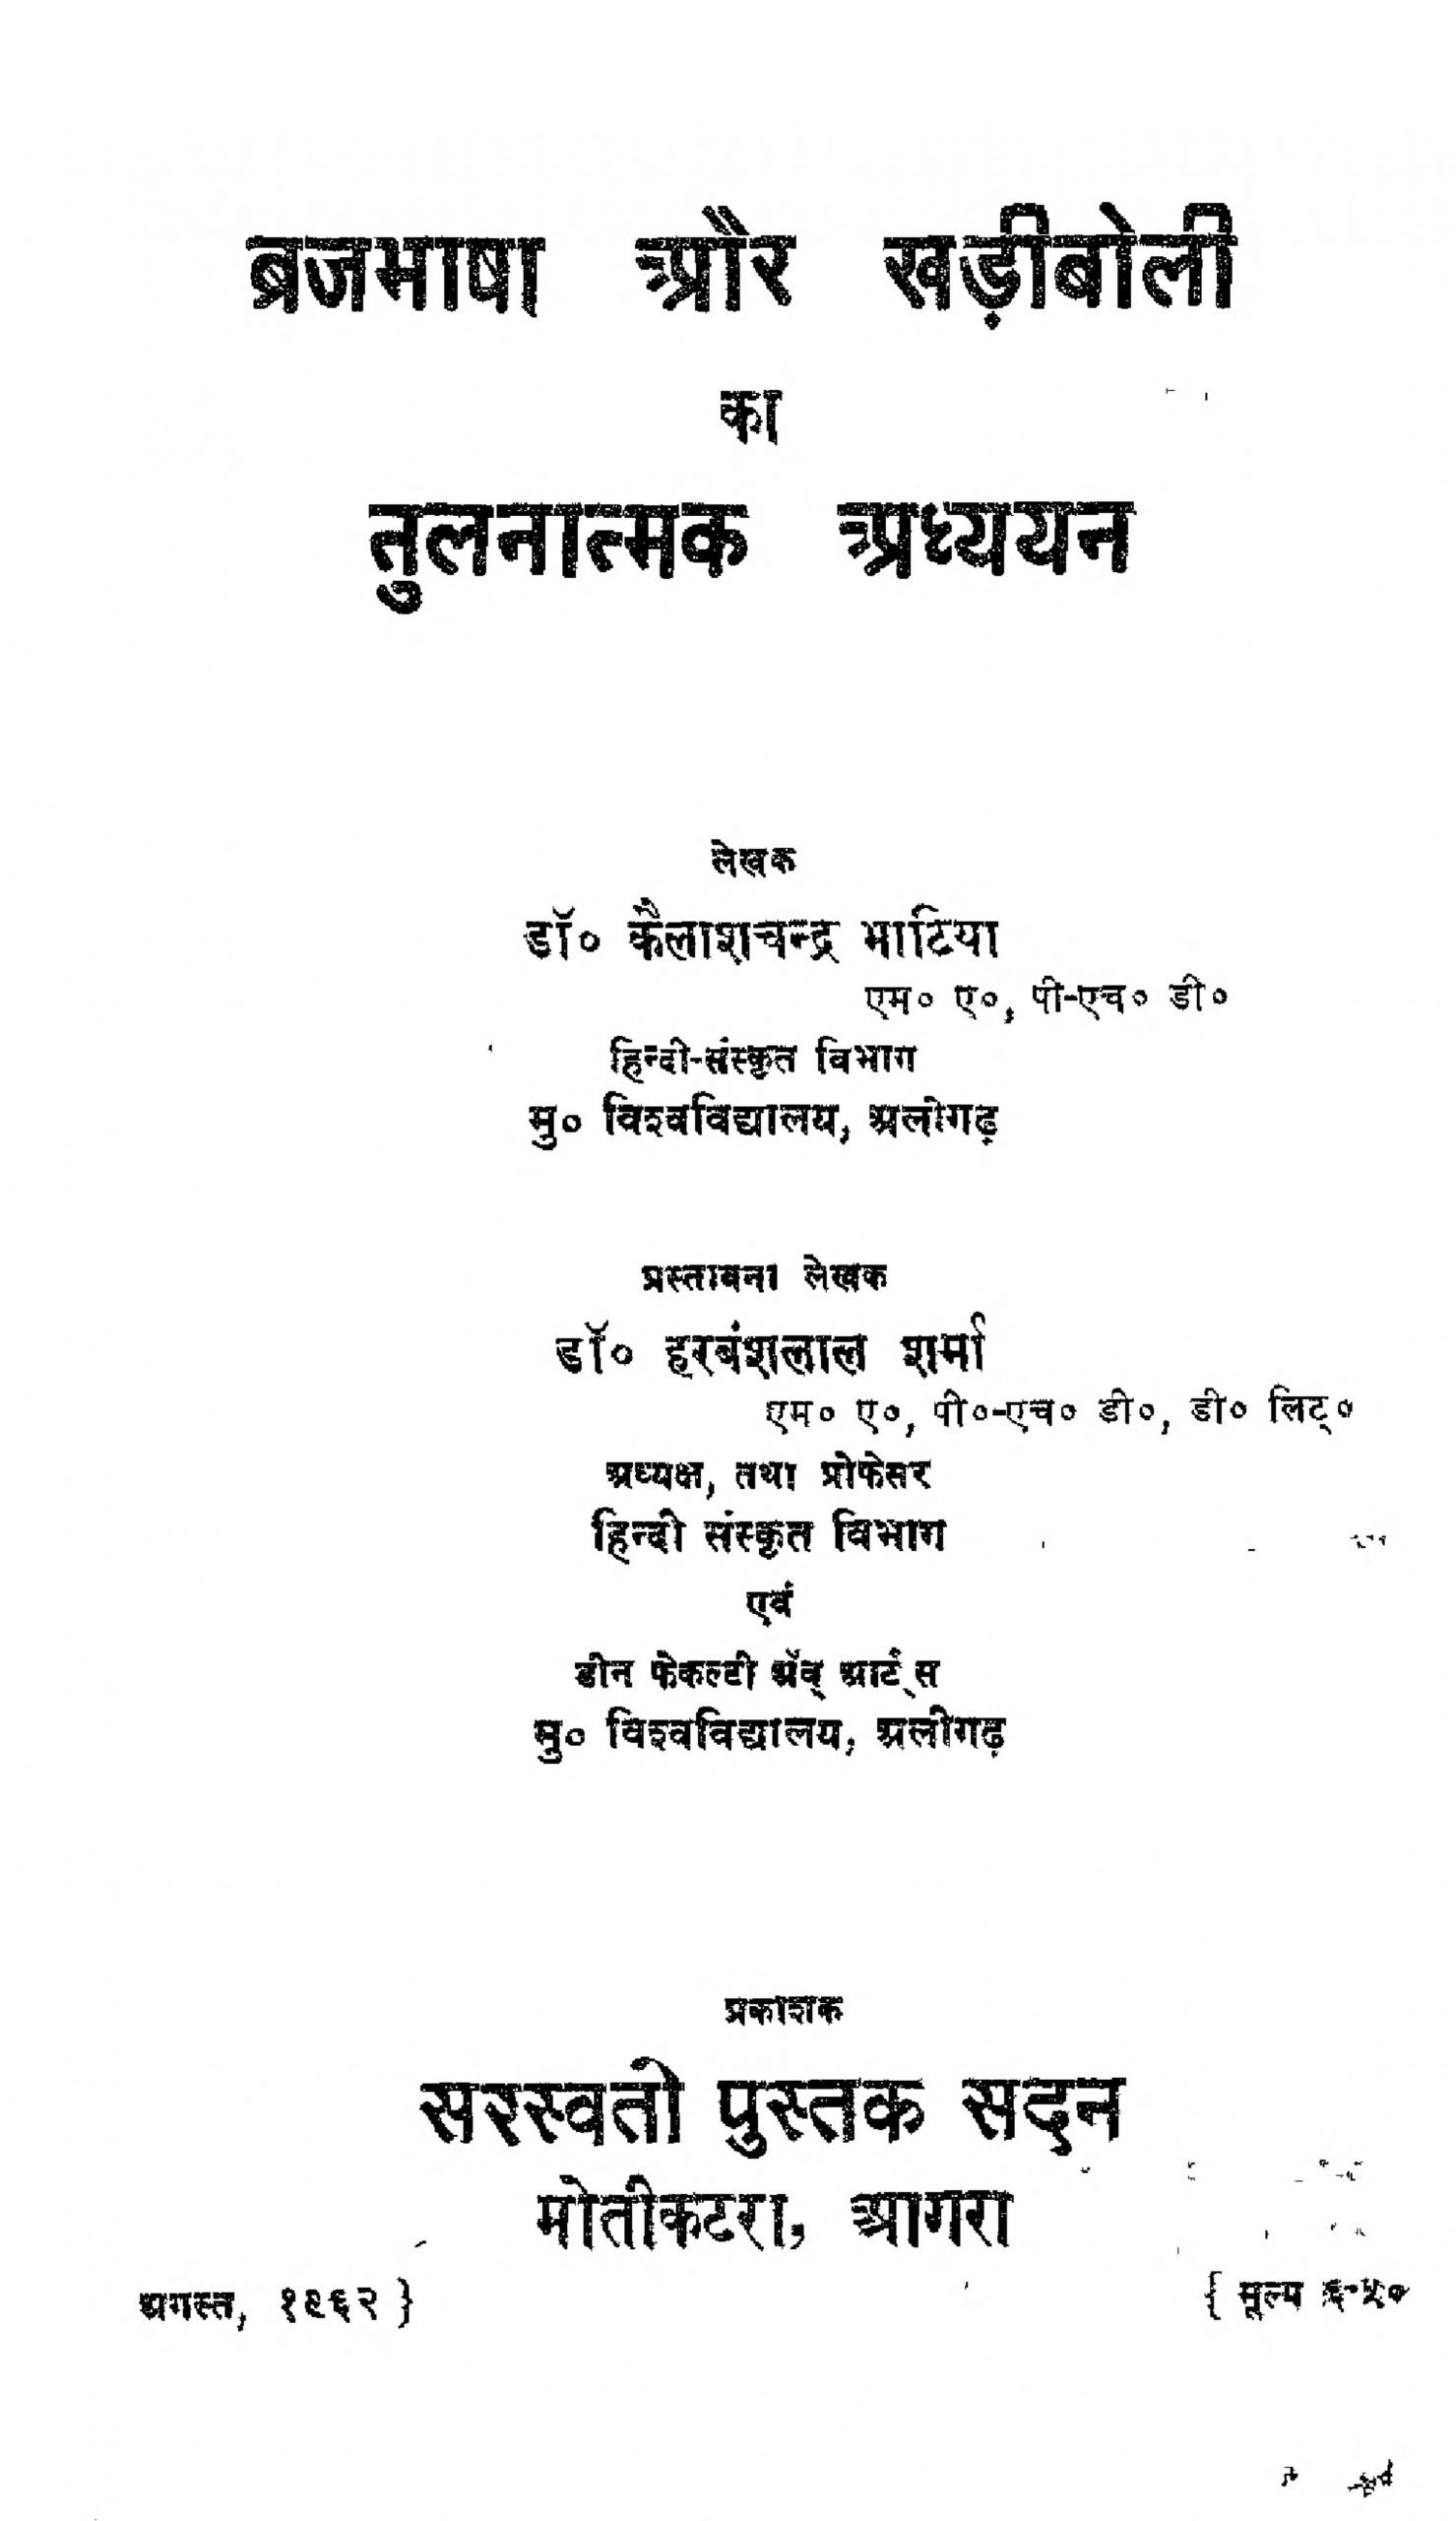 Book Image : ब्रजभाषा और खड़ीबोली का तुलनात्मक अध्ययन  - Brajabhasha Aur Khadiboli Ka Tulanatmak Adhyayan